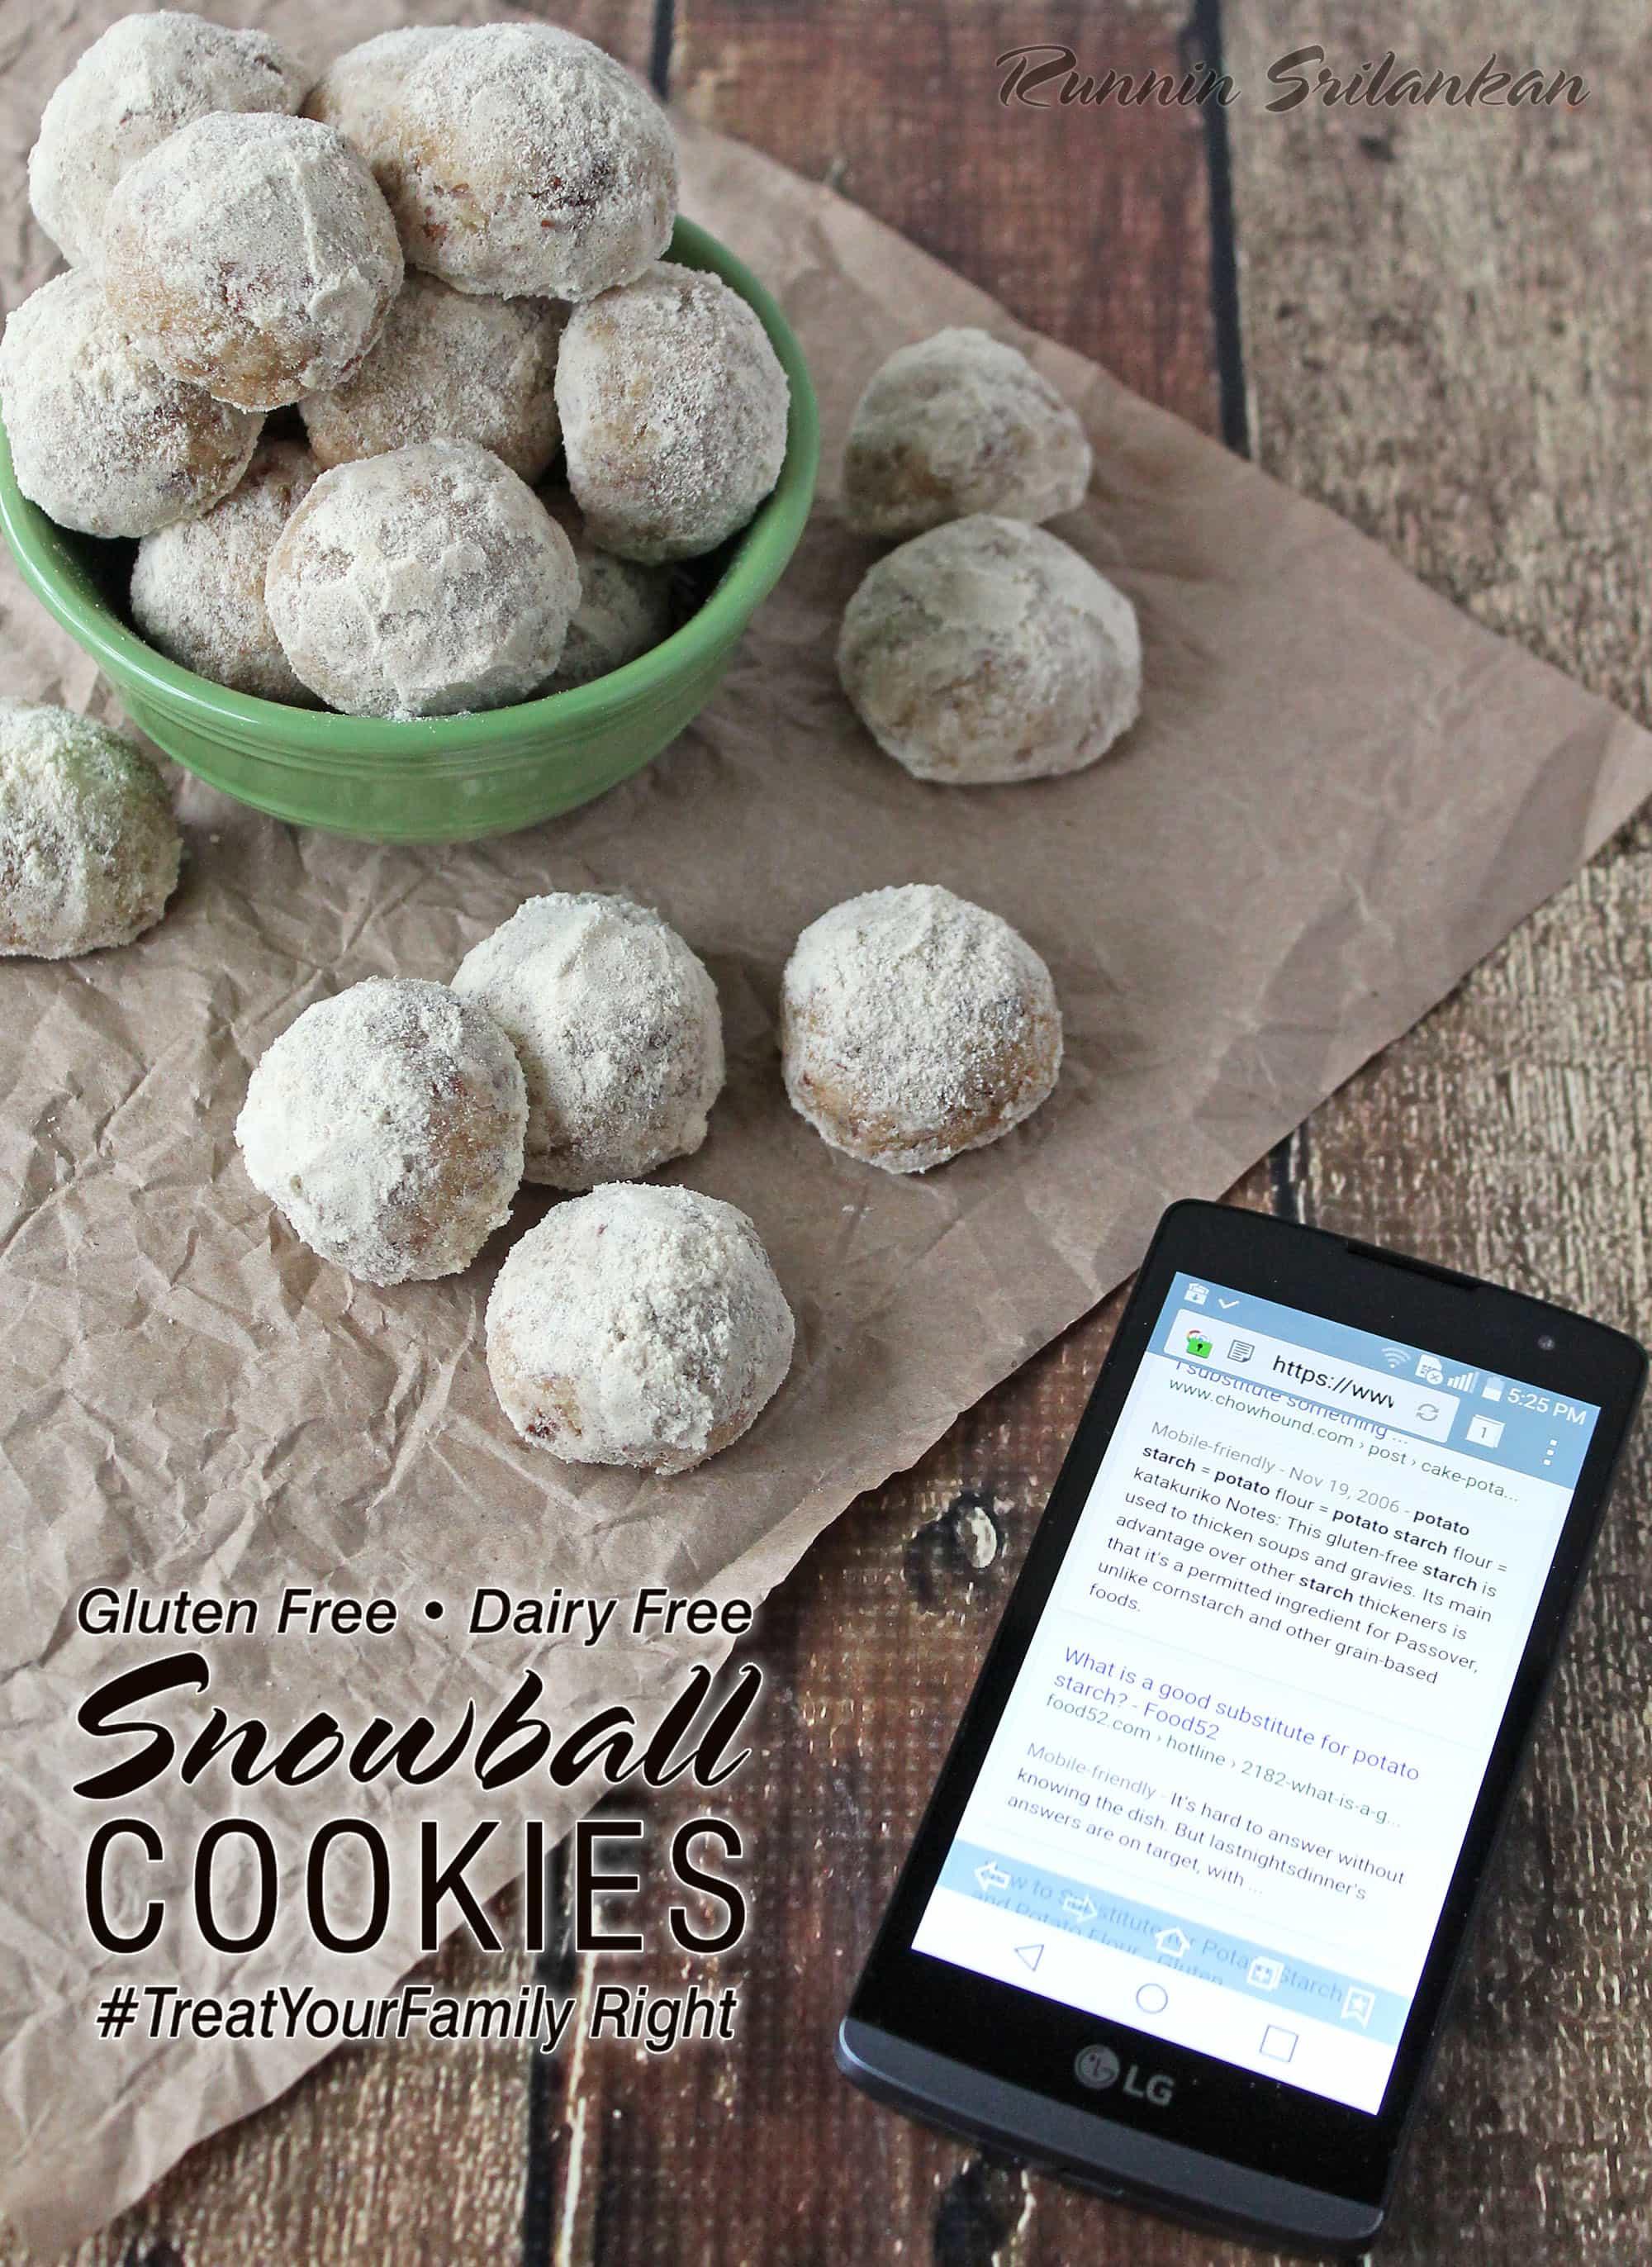 Snowball-Cookies-#TreatYourFamily